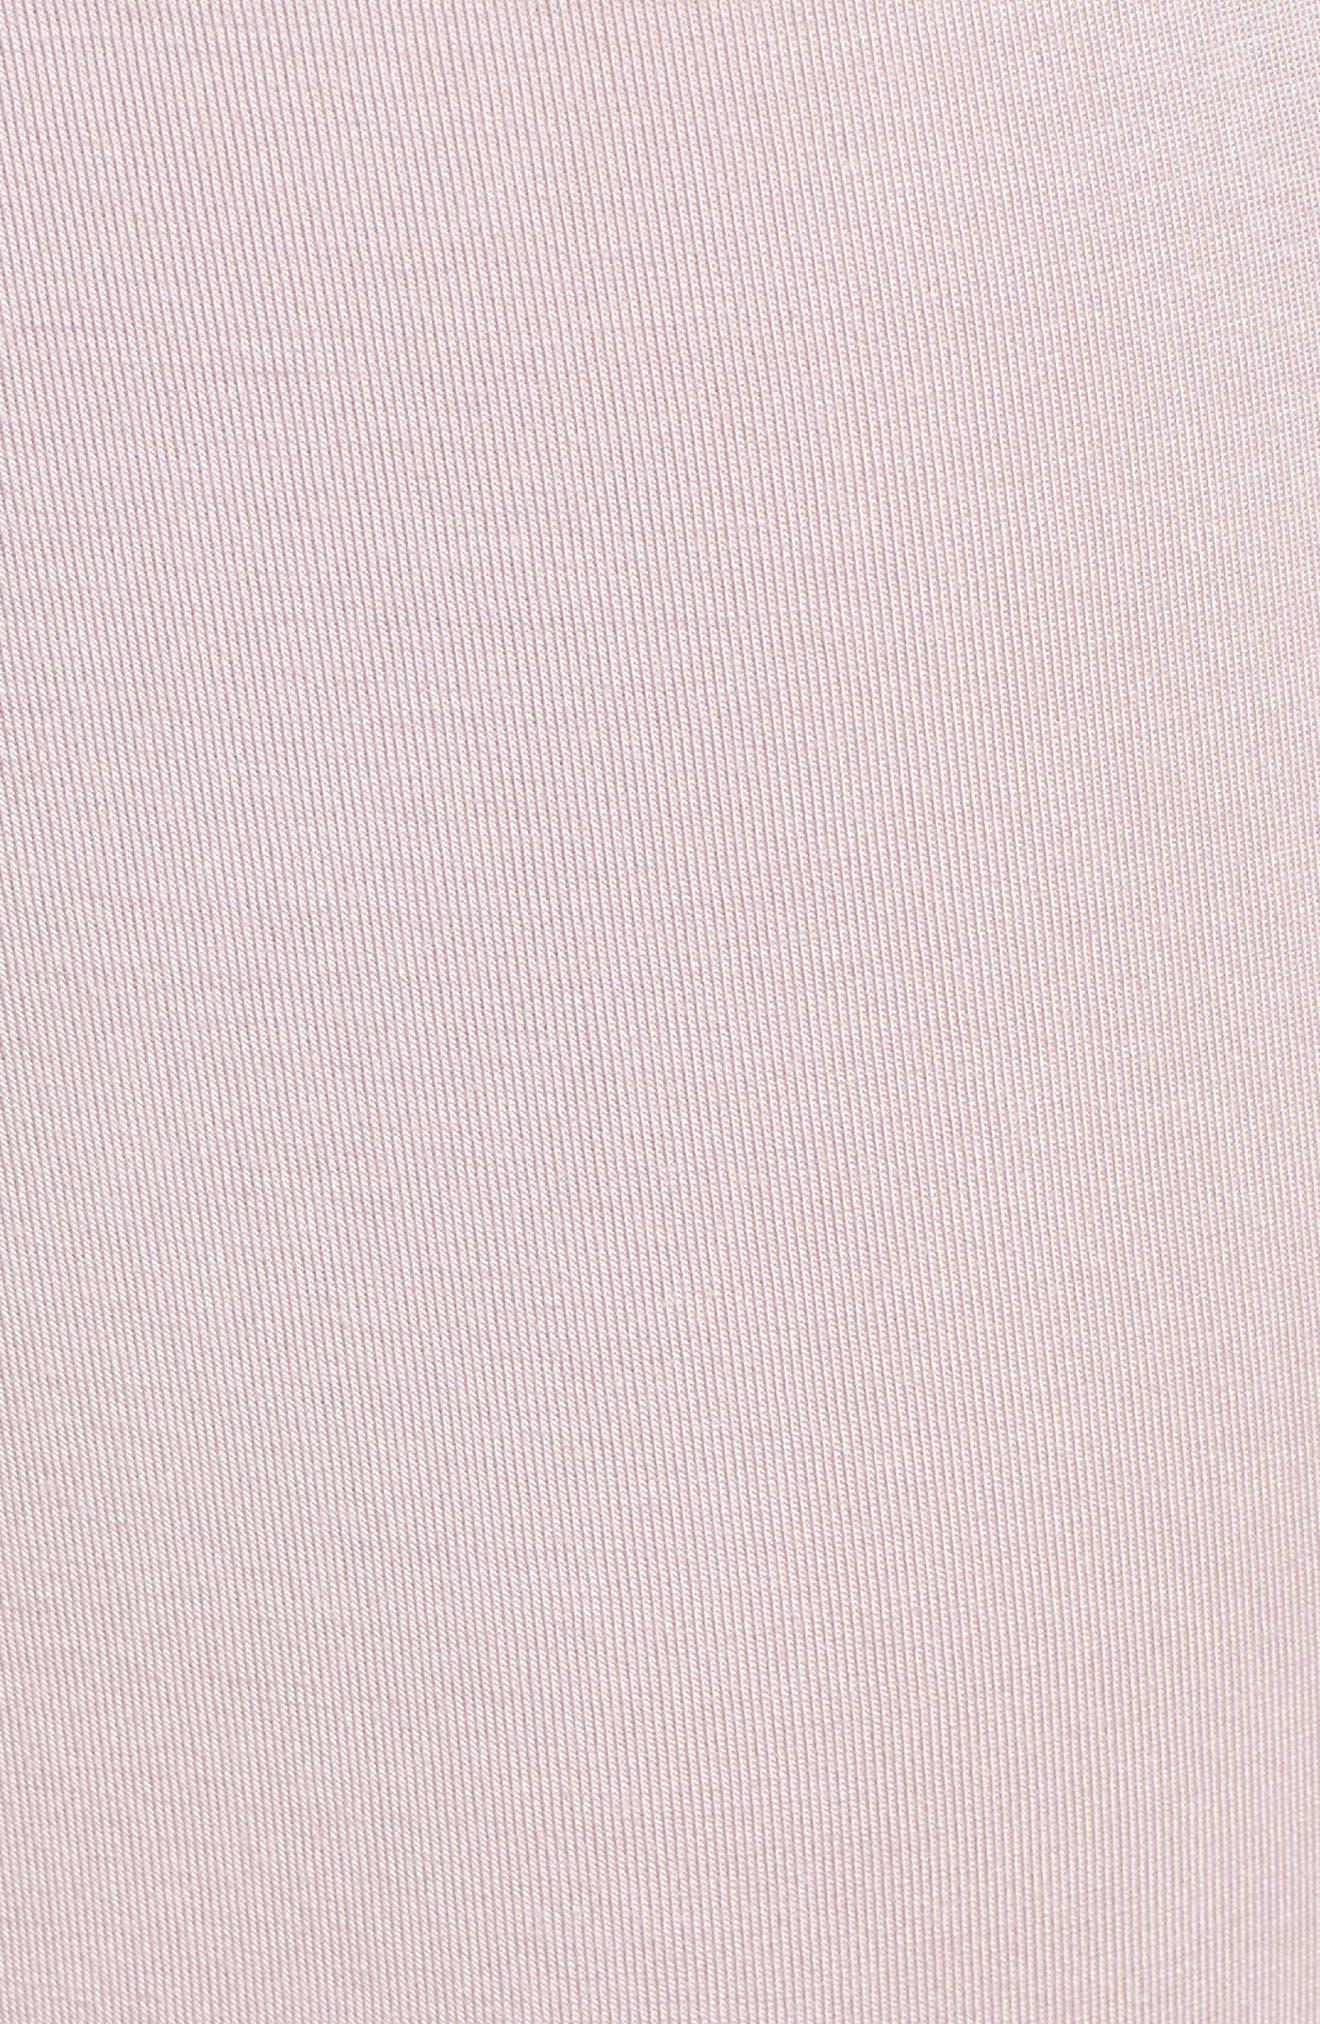 Polly Lounge Pants,                             Alternate thumbnail 5, color,                             650